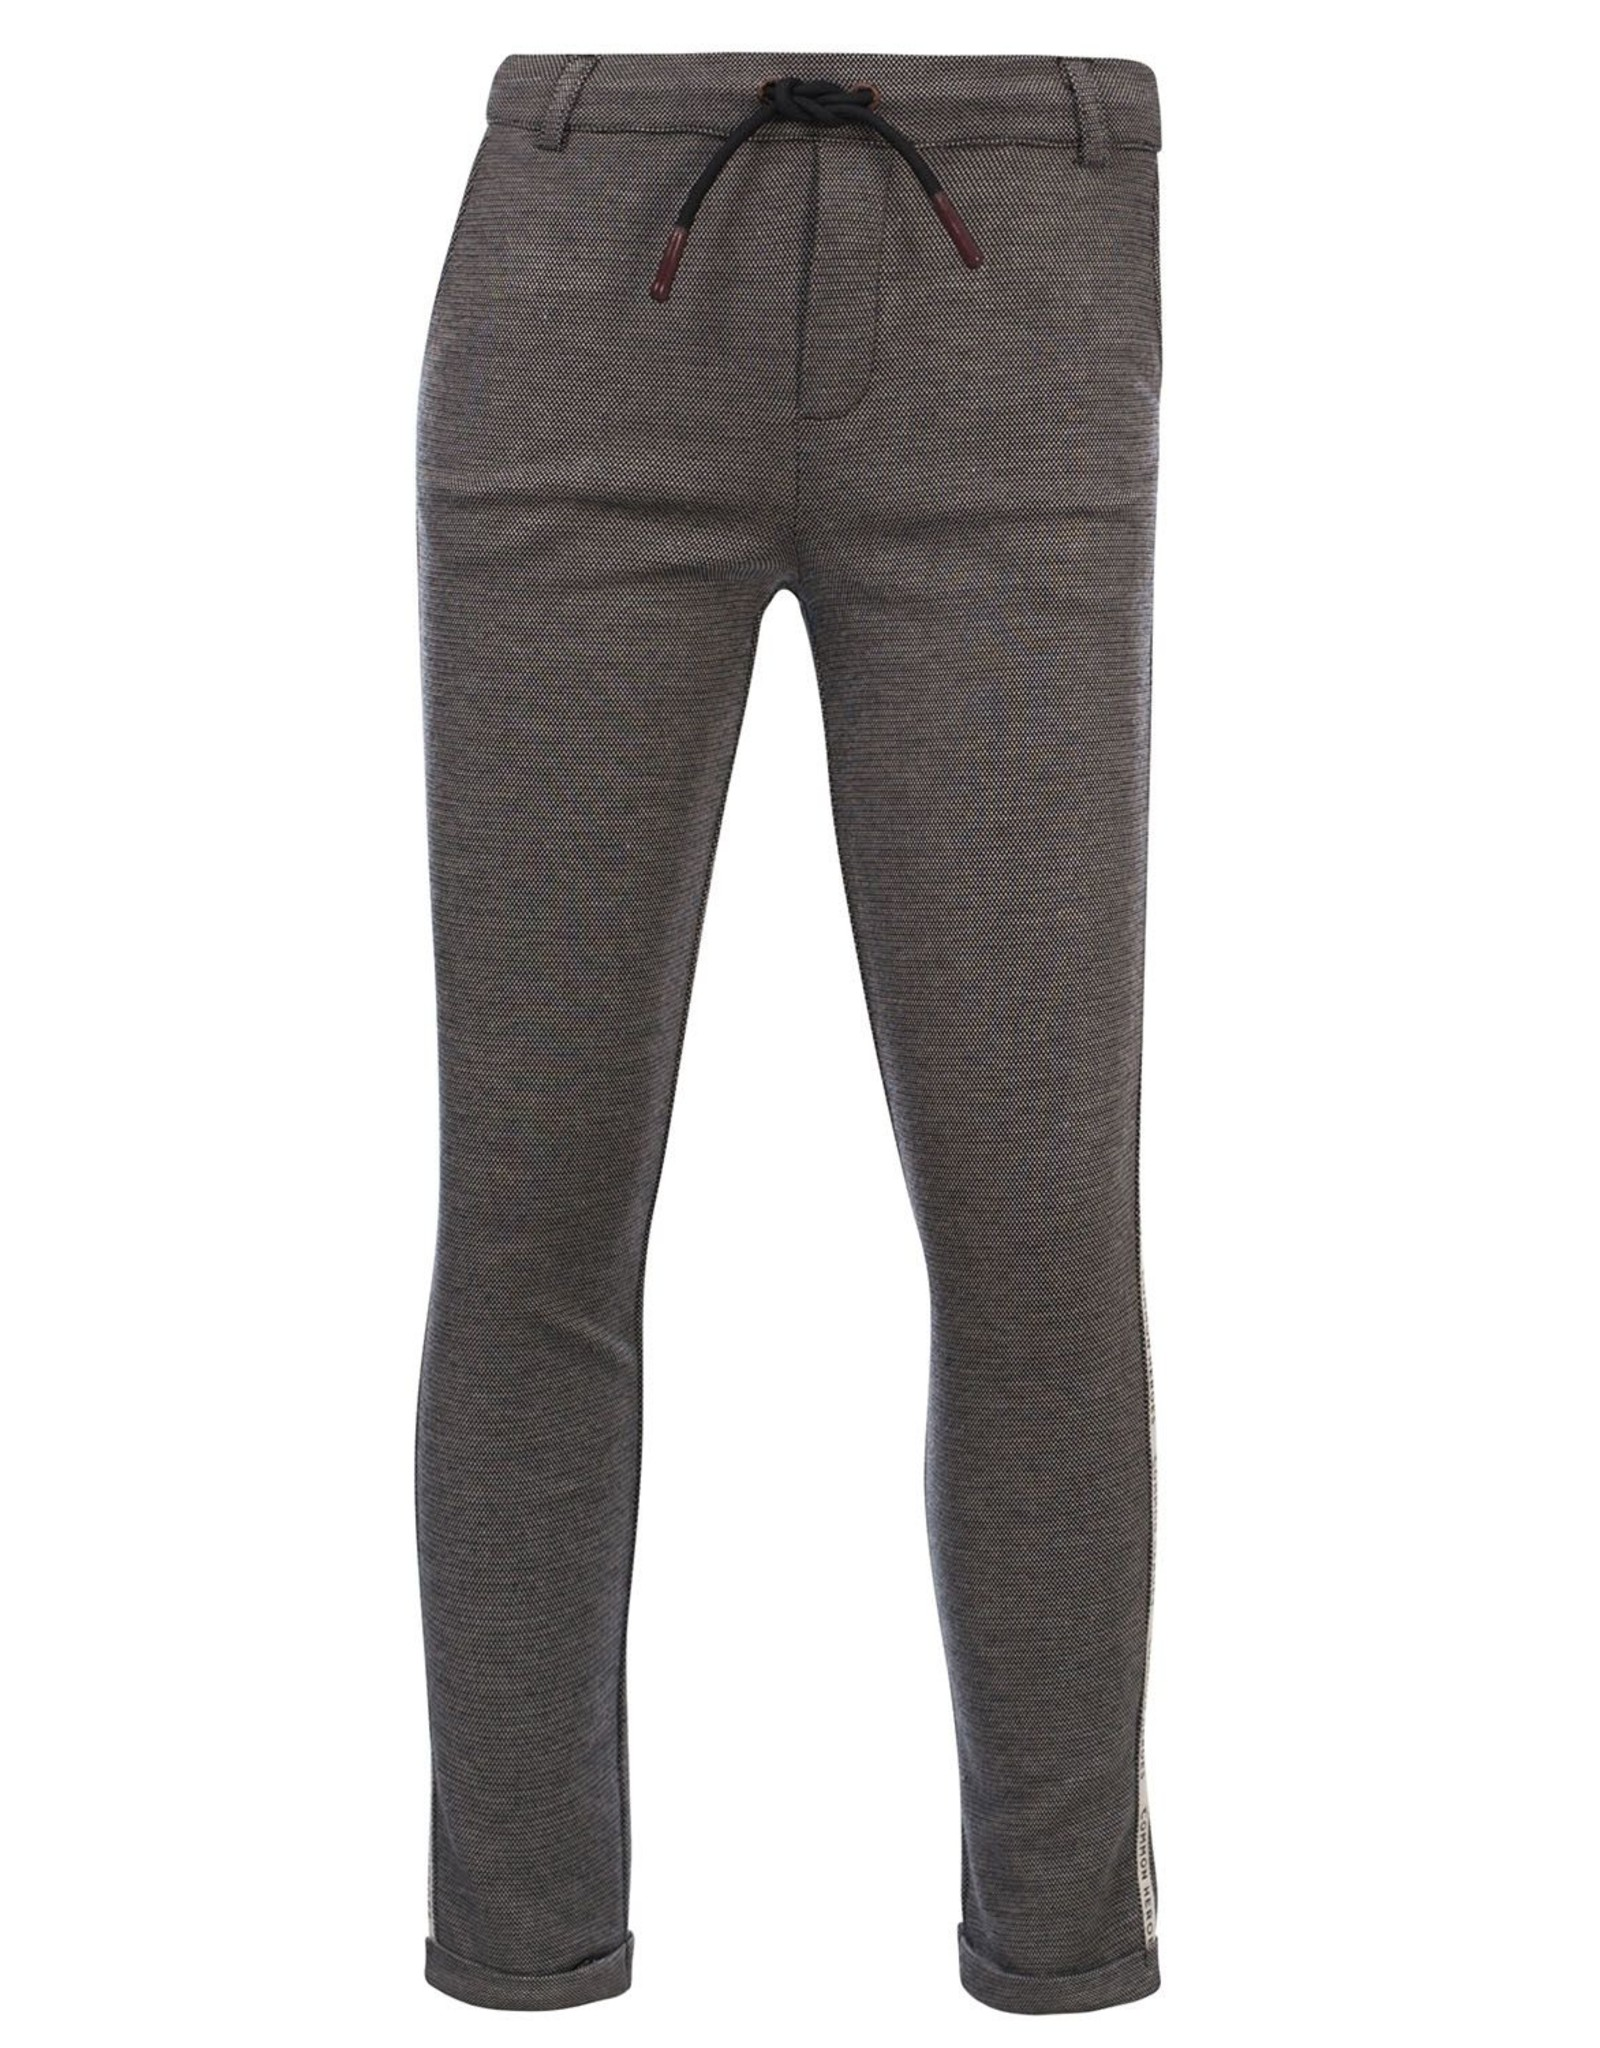 Common Heroes BAAS Fancy Chino sweat pants1